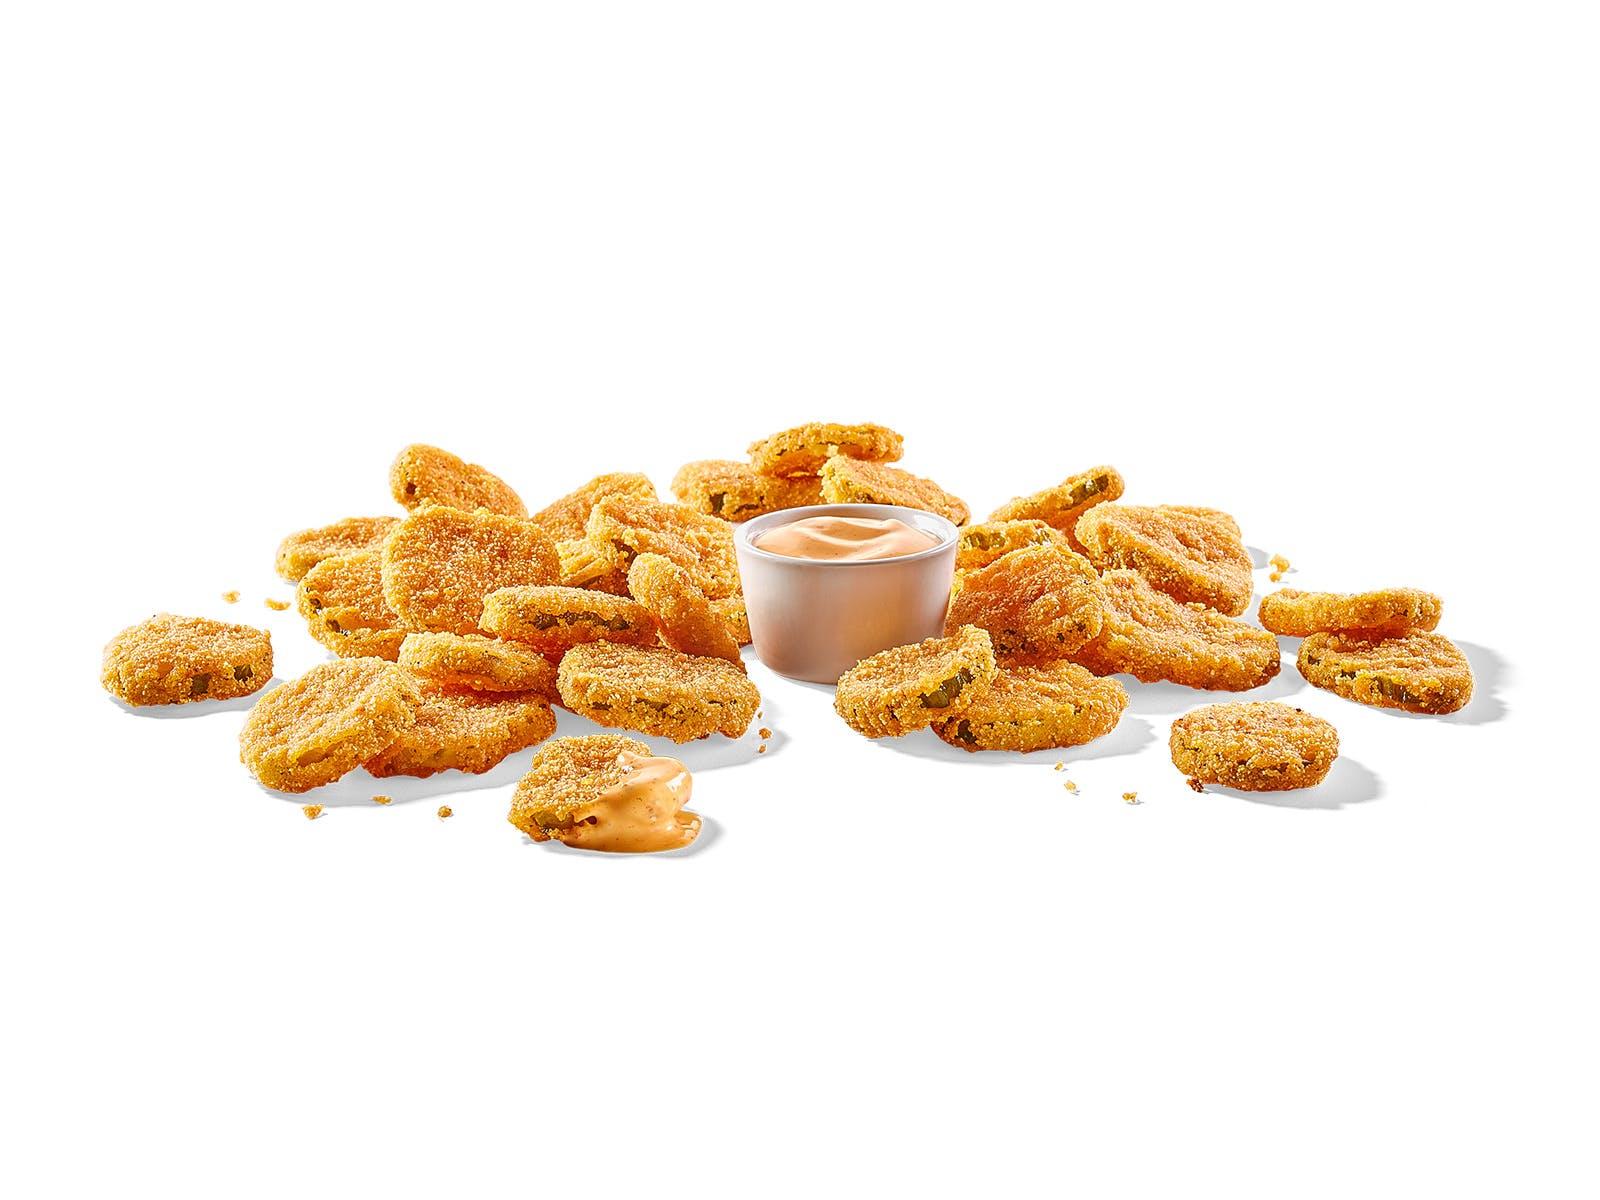 Fried Pickles from Buffalo Wild Wings - Lawrence (522) in Lawrence, KS